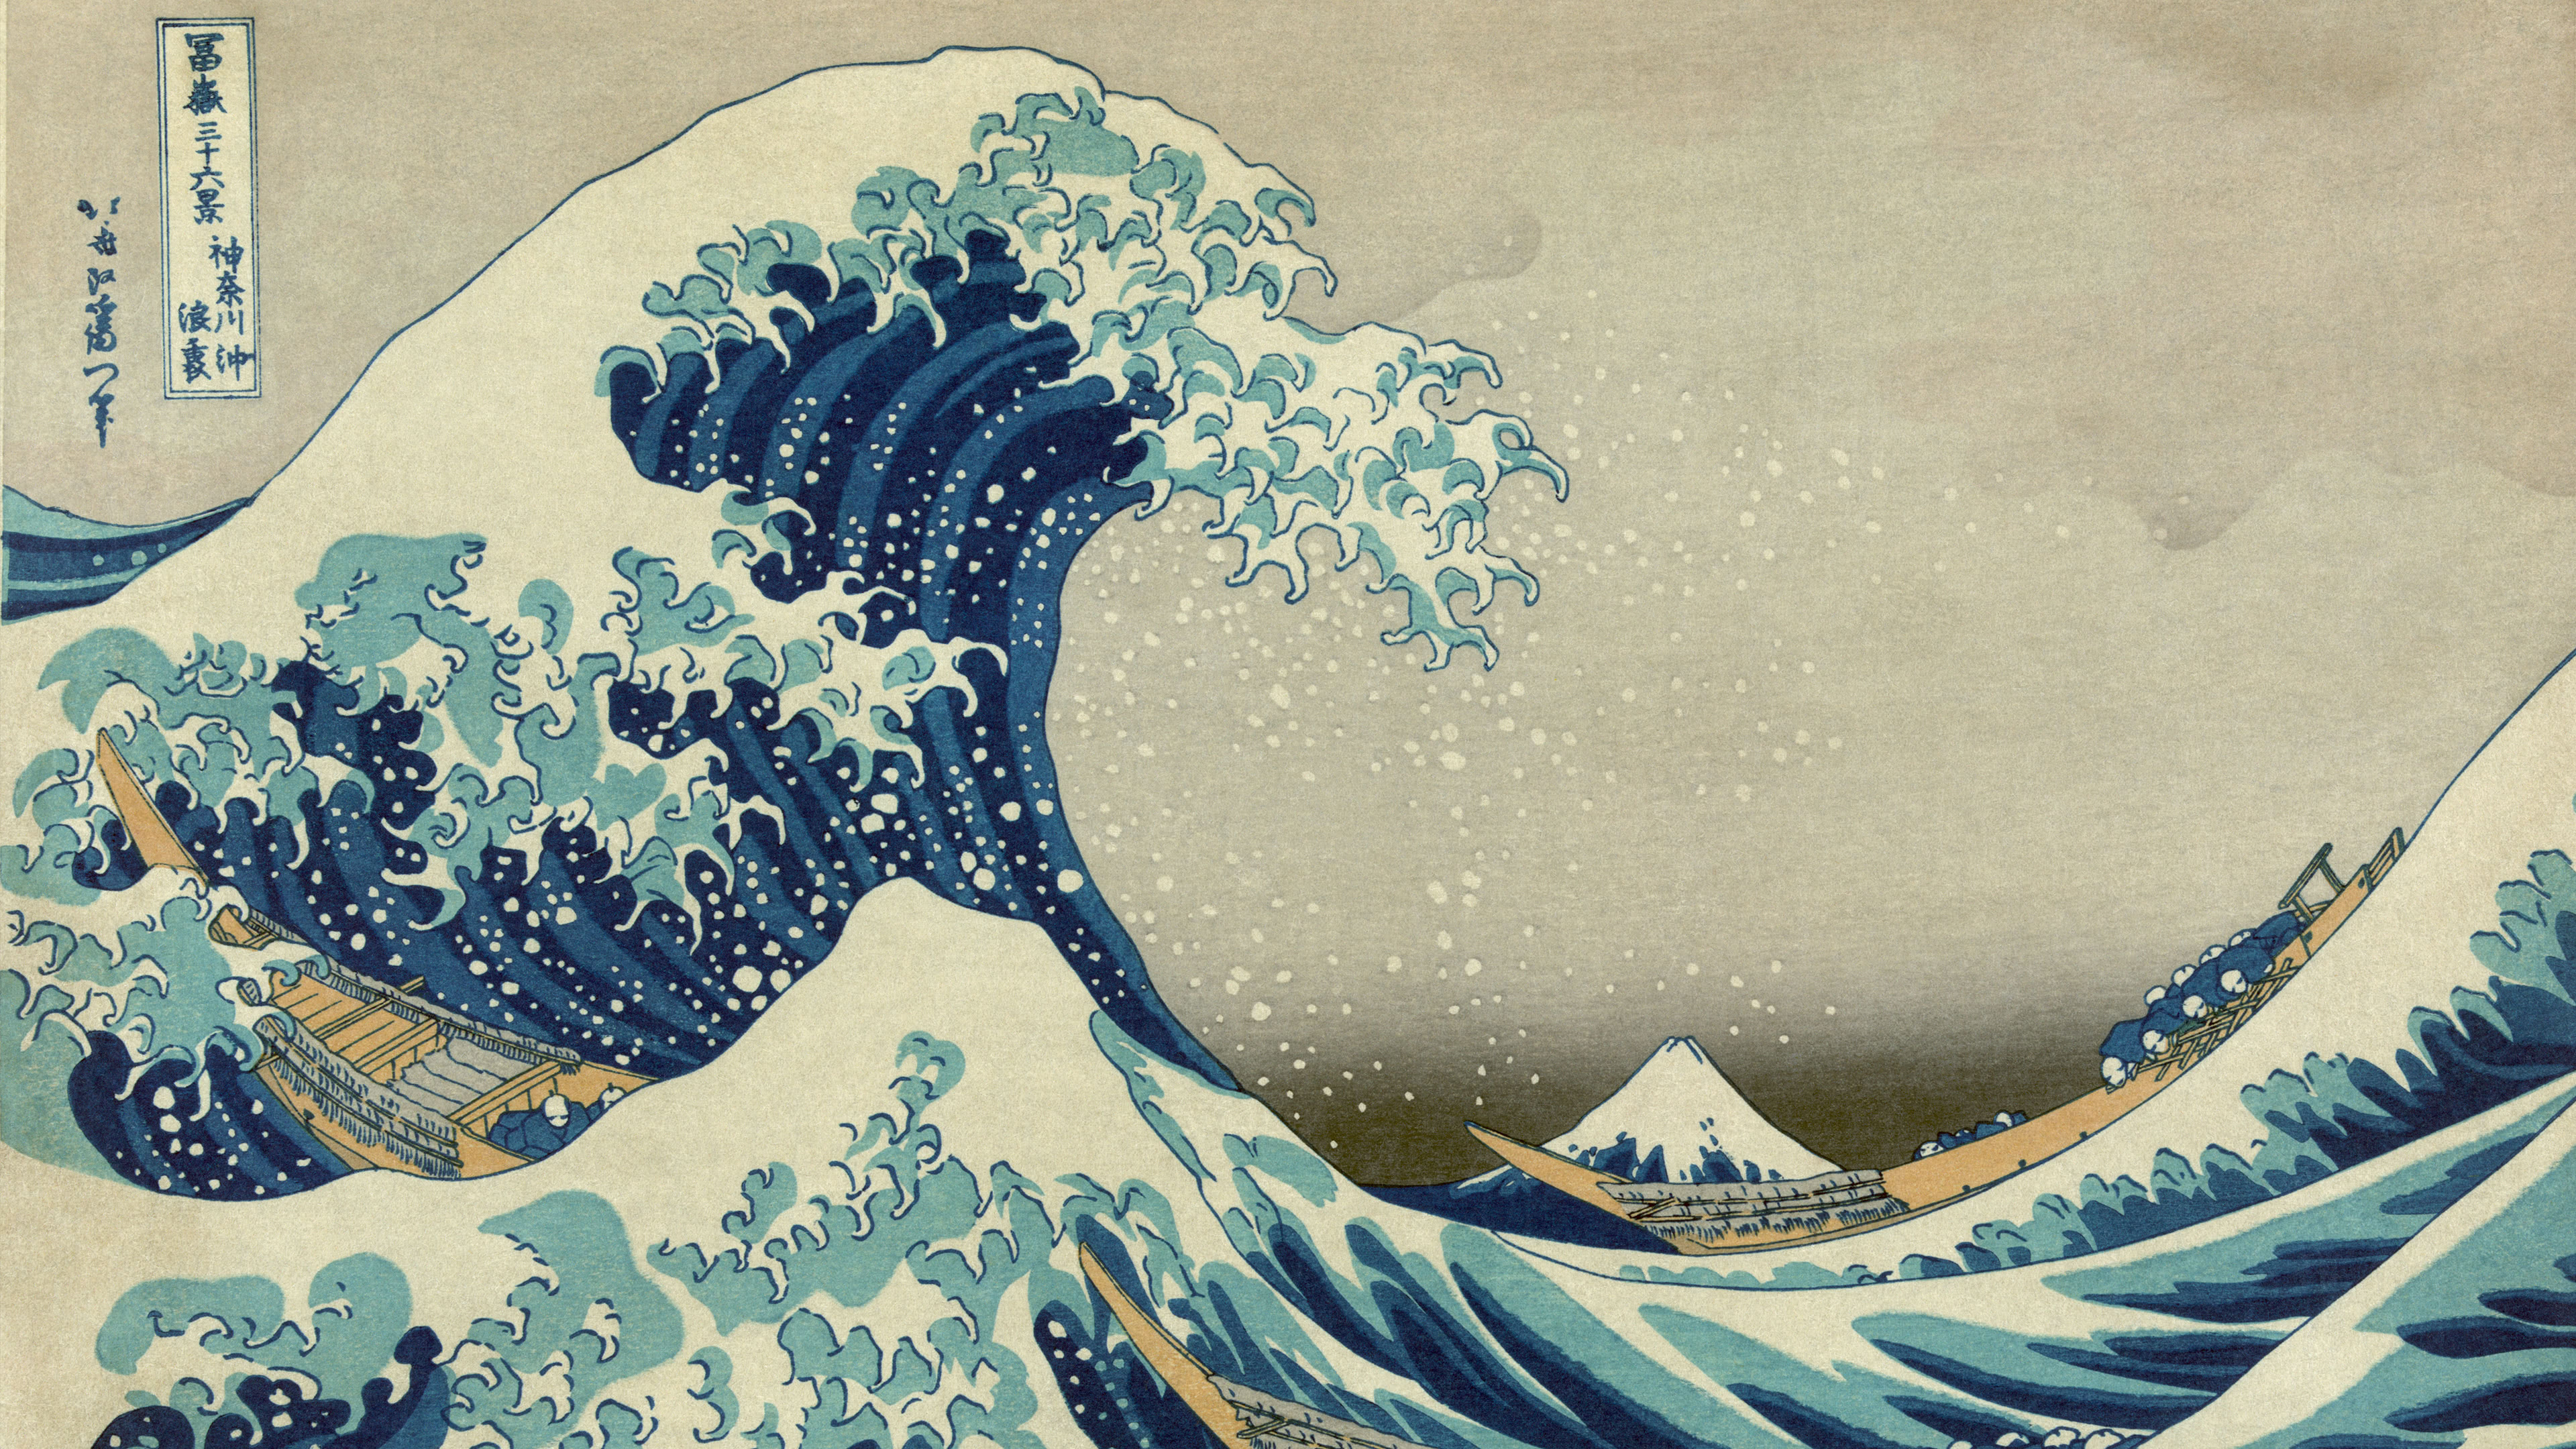 the great wave off kanagawa katsushika hokusai uhd 4k wallpaper